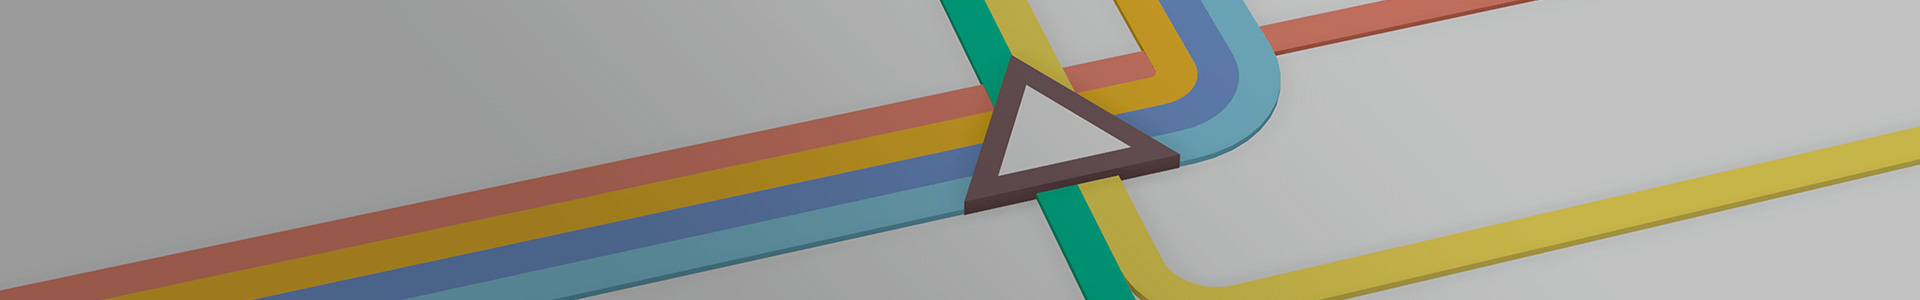 Banner media of Mini Metro video game.